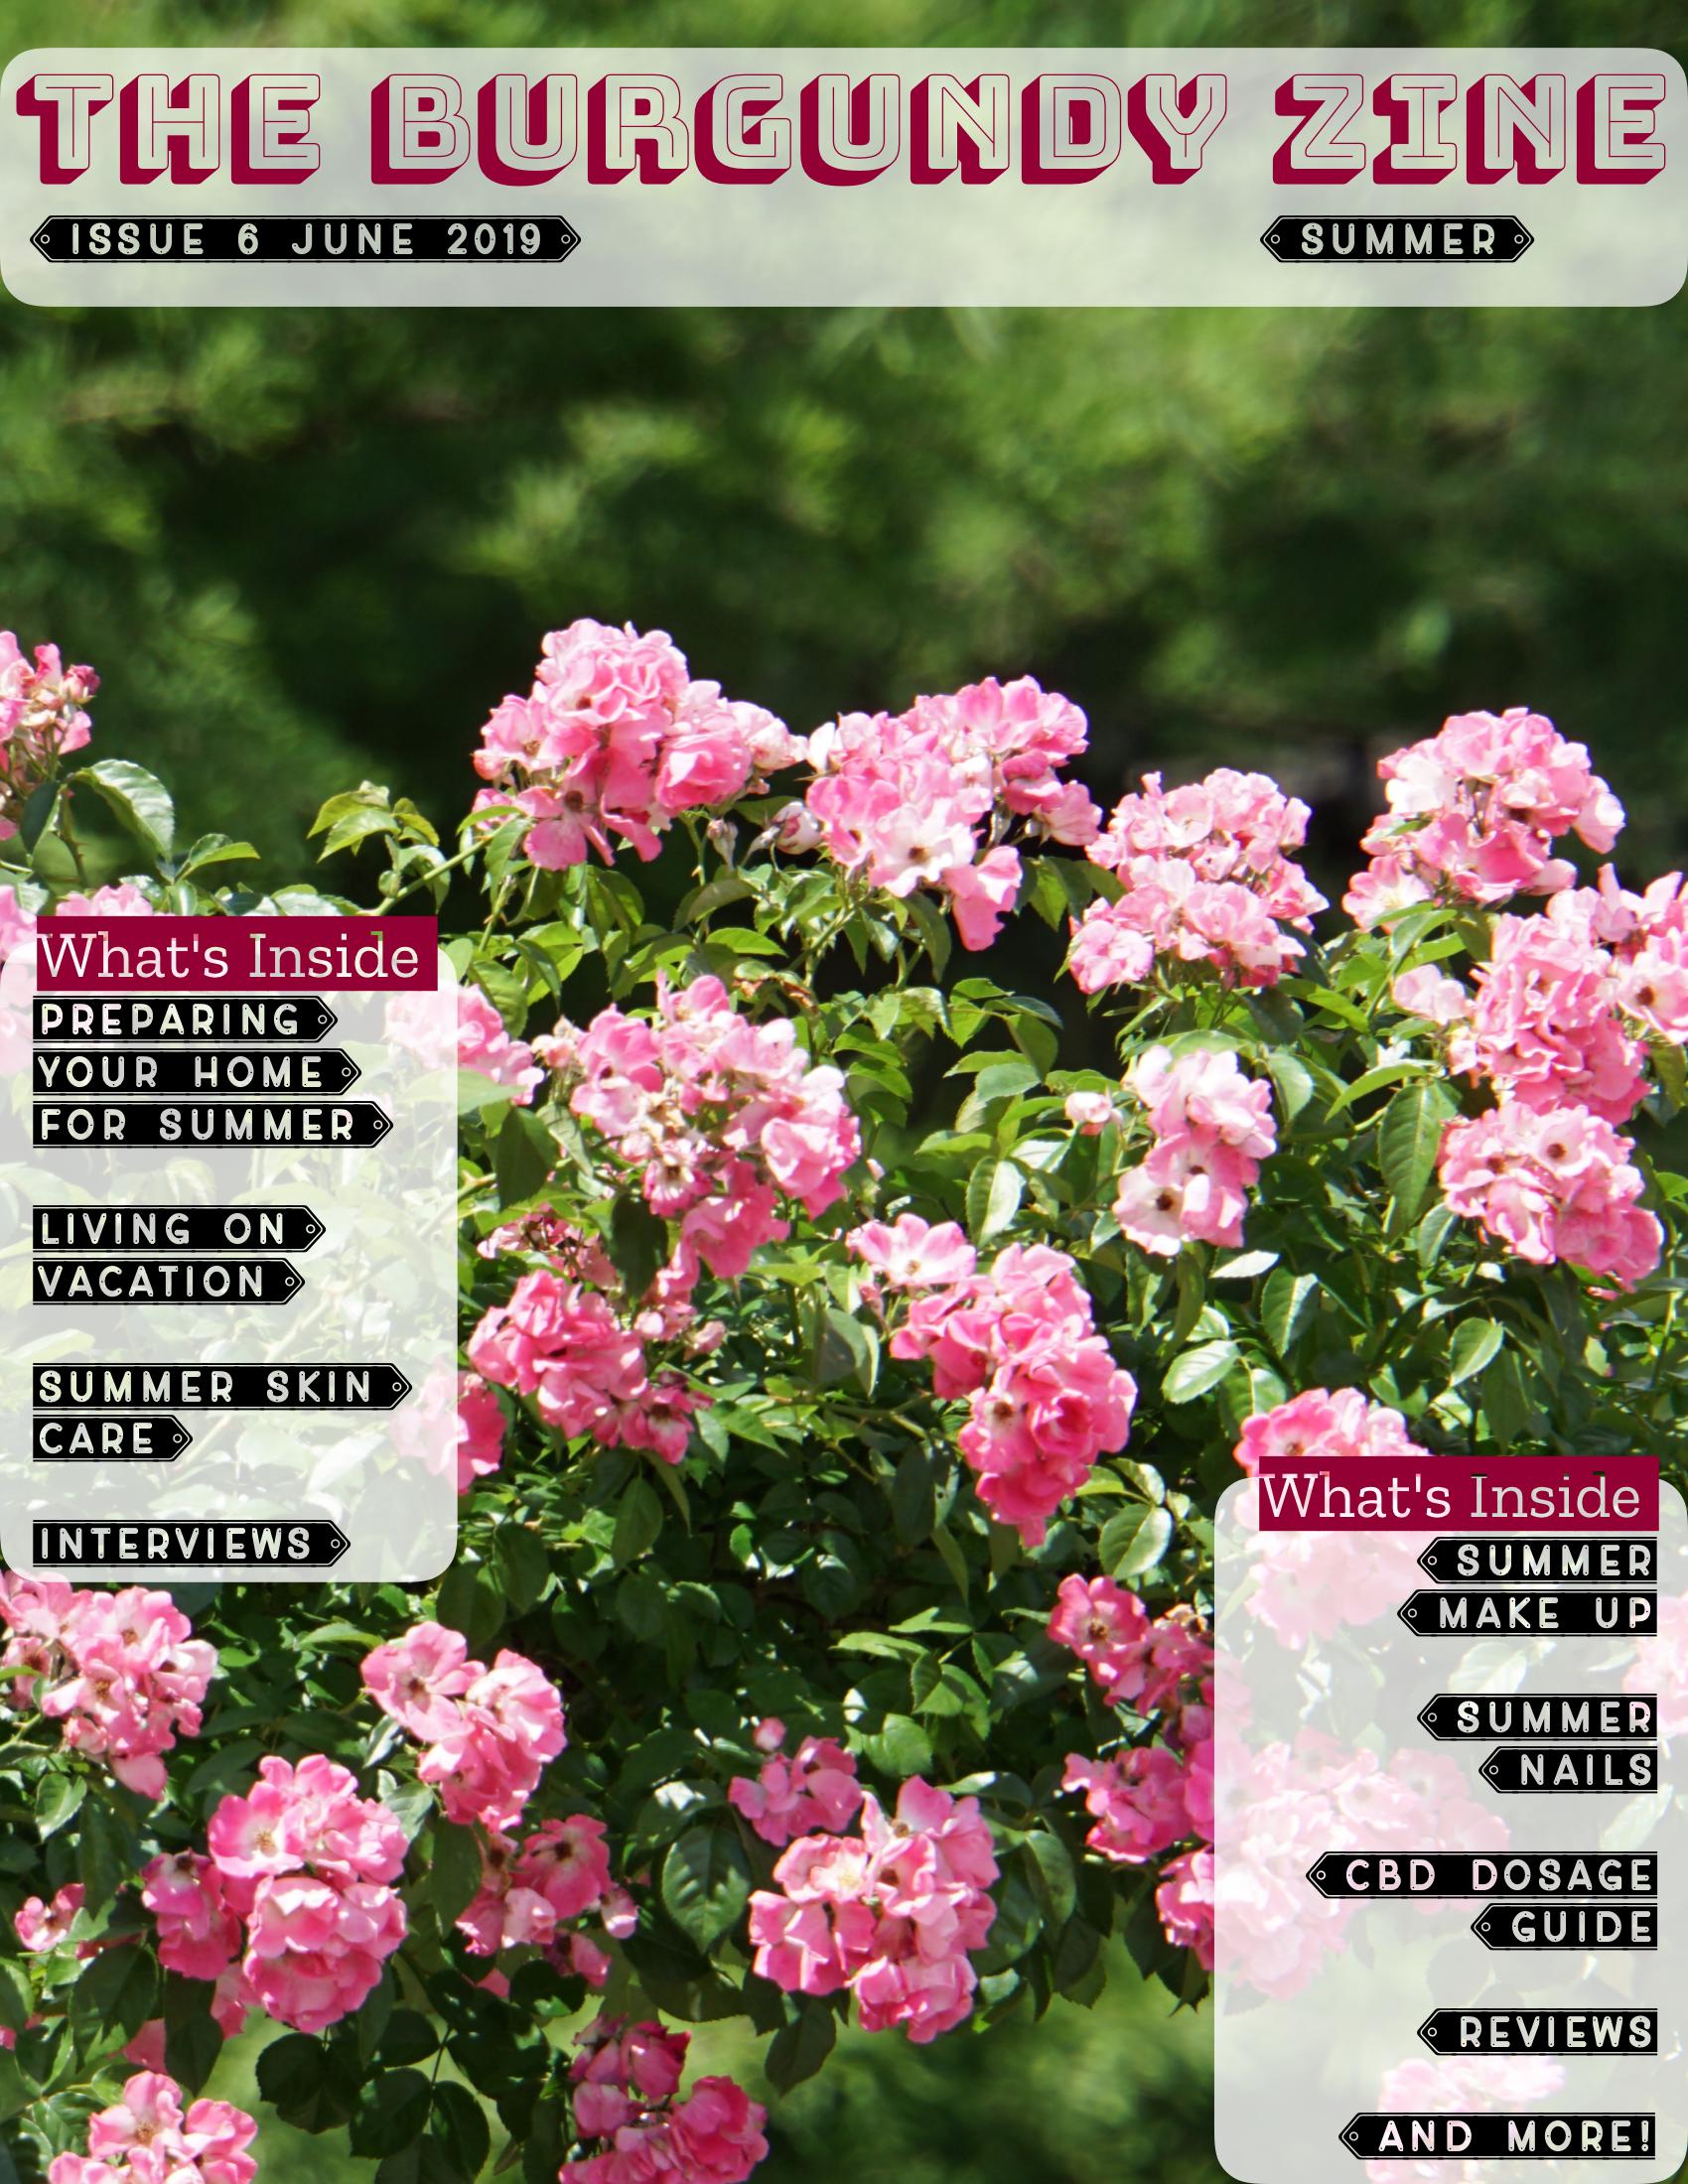 The Burgundy Zine #6: Summer Pg. 01